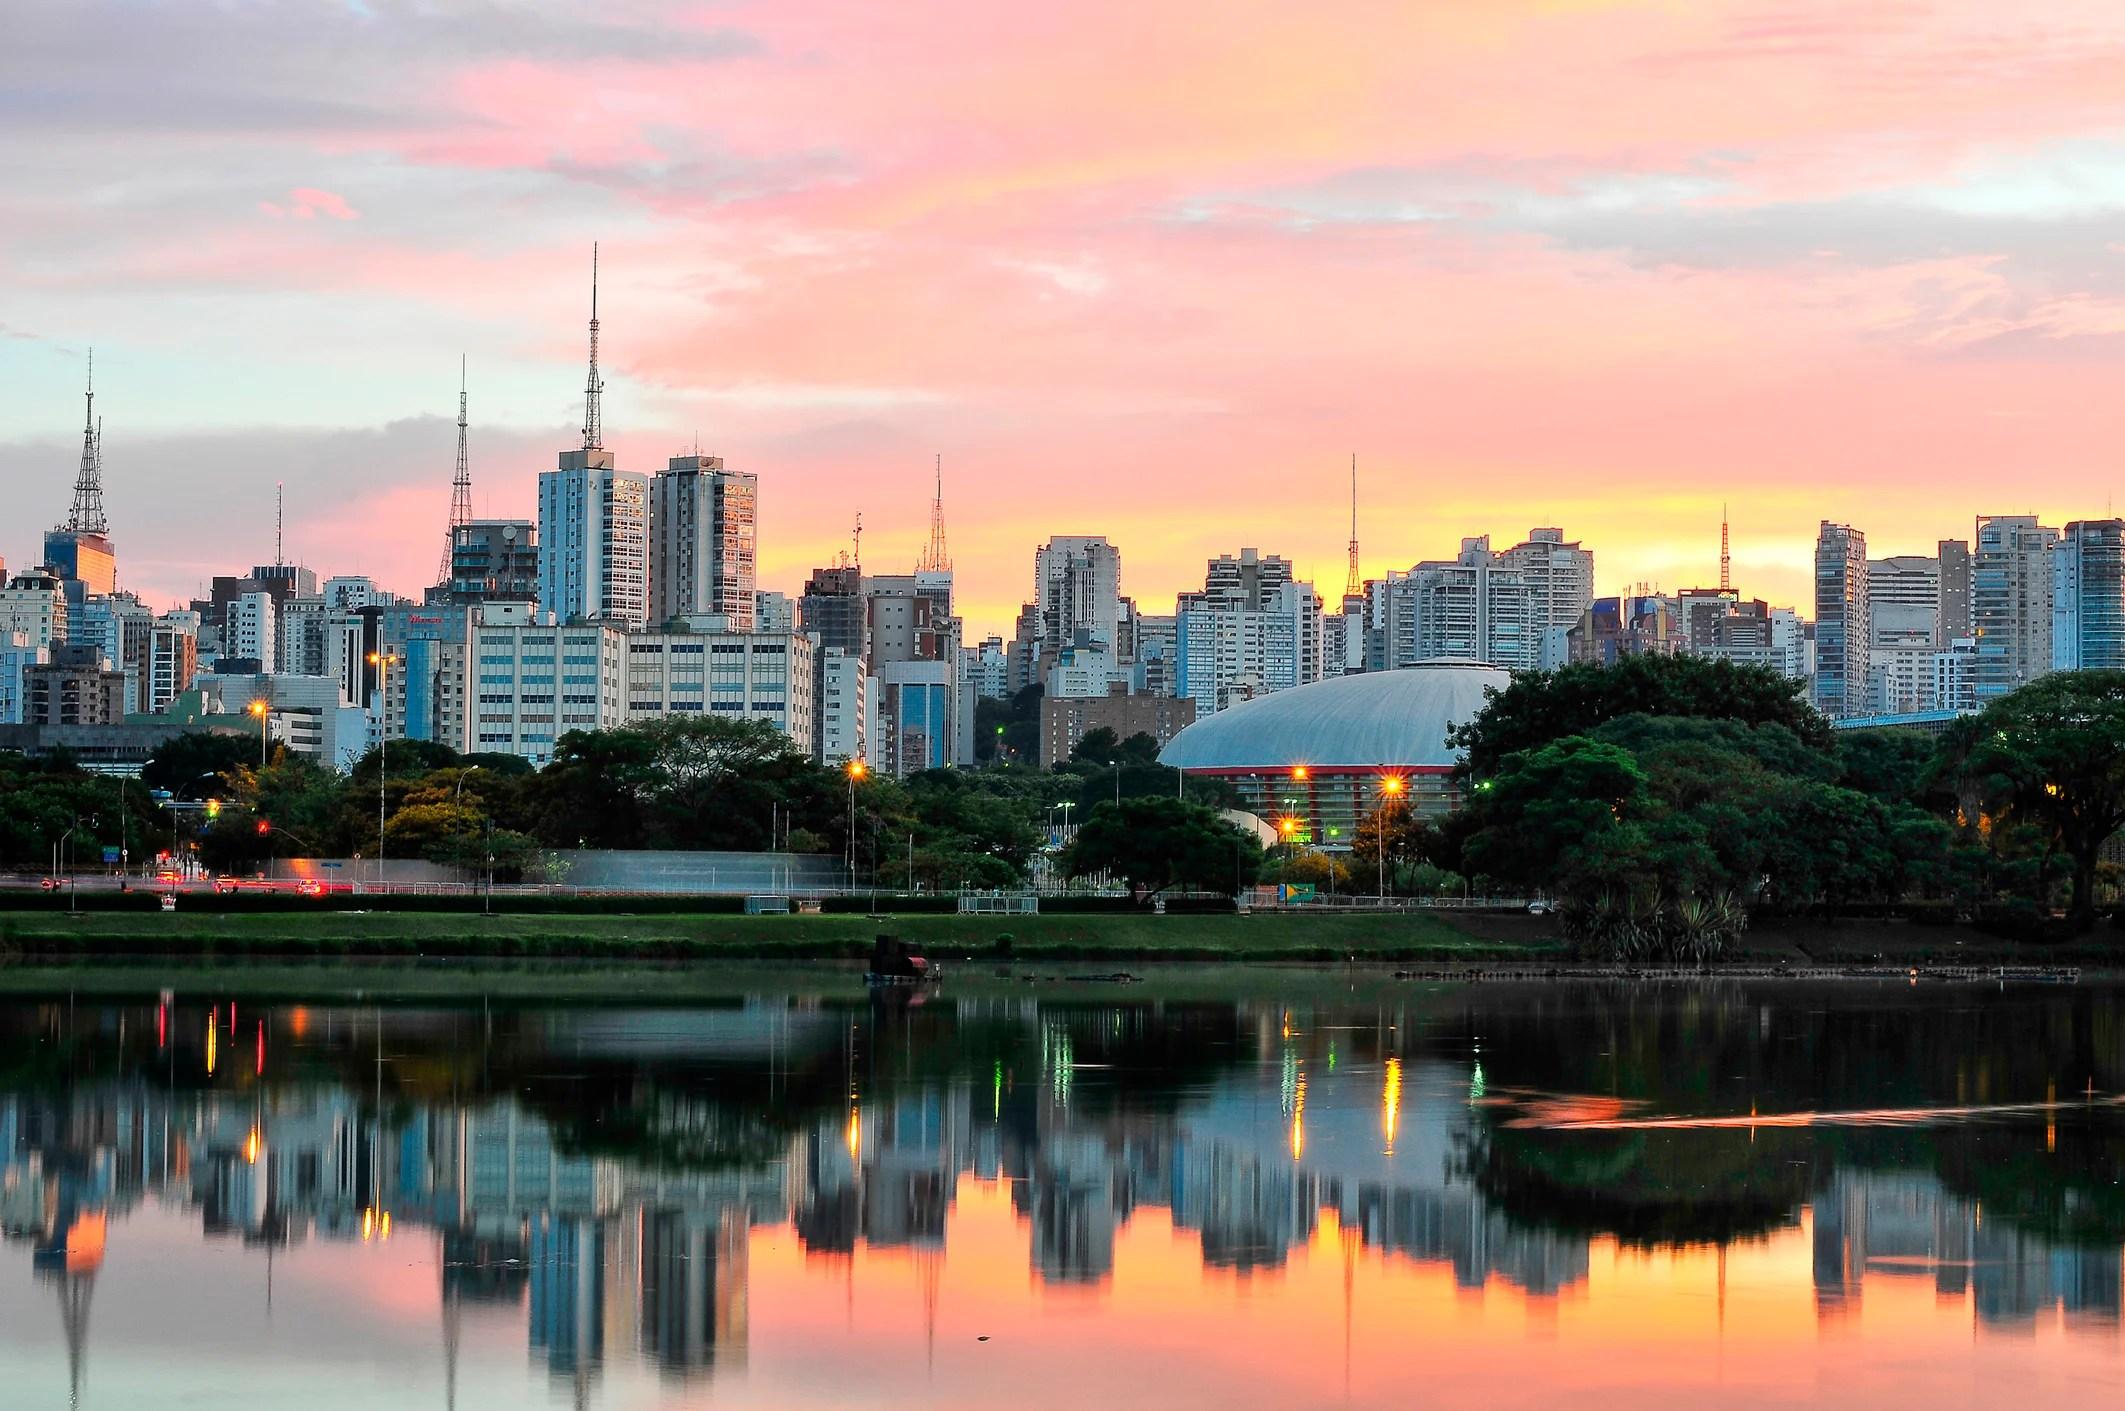 Deal Alert: Flights to Brazil From $389 Round-Trip